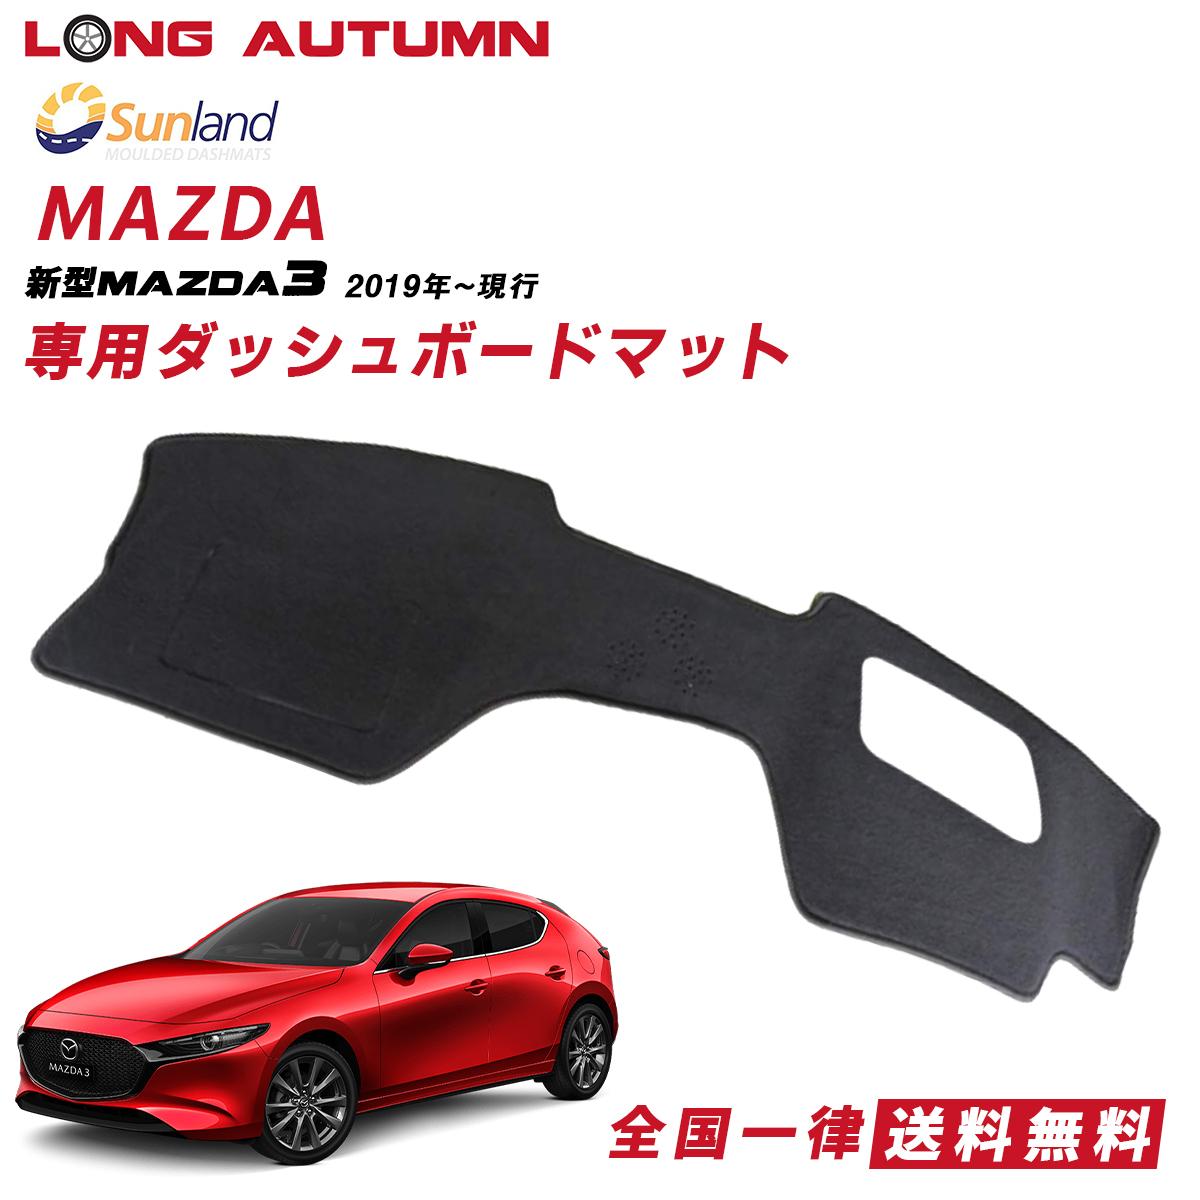 Mazda 新型 Mazda3 BP 2019年~現行 専用 立体成型 HAIGH社製 Sunland サンランド ダッシュマット ダッシュボードマット カバー ブラック 春 夏 暑さ対策 冷却 快適 アウドドア ドライブ 車用品 内装パーツ